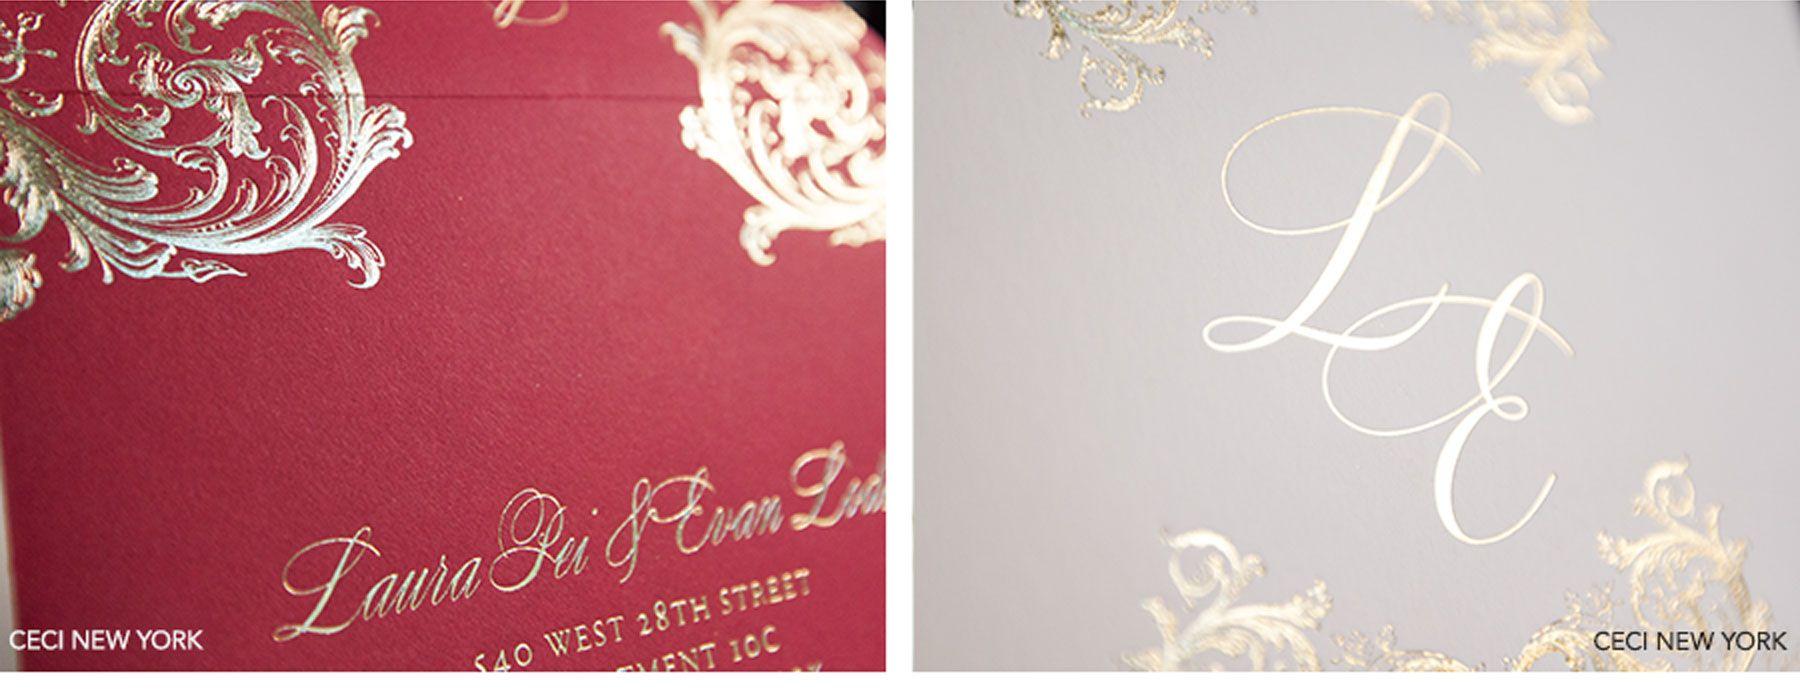 St Regis New York wedding | DAUGHTER OF DESIGN REAL WEDDINGS ...